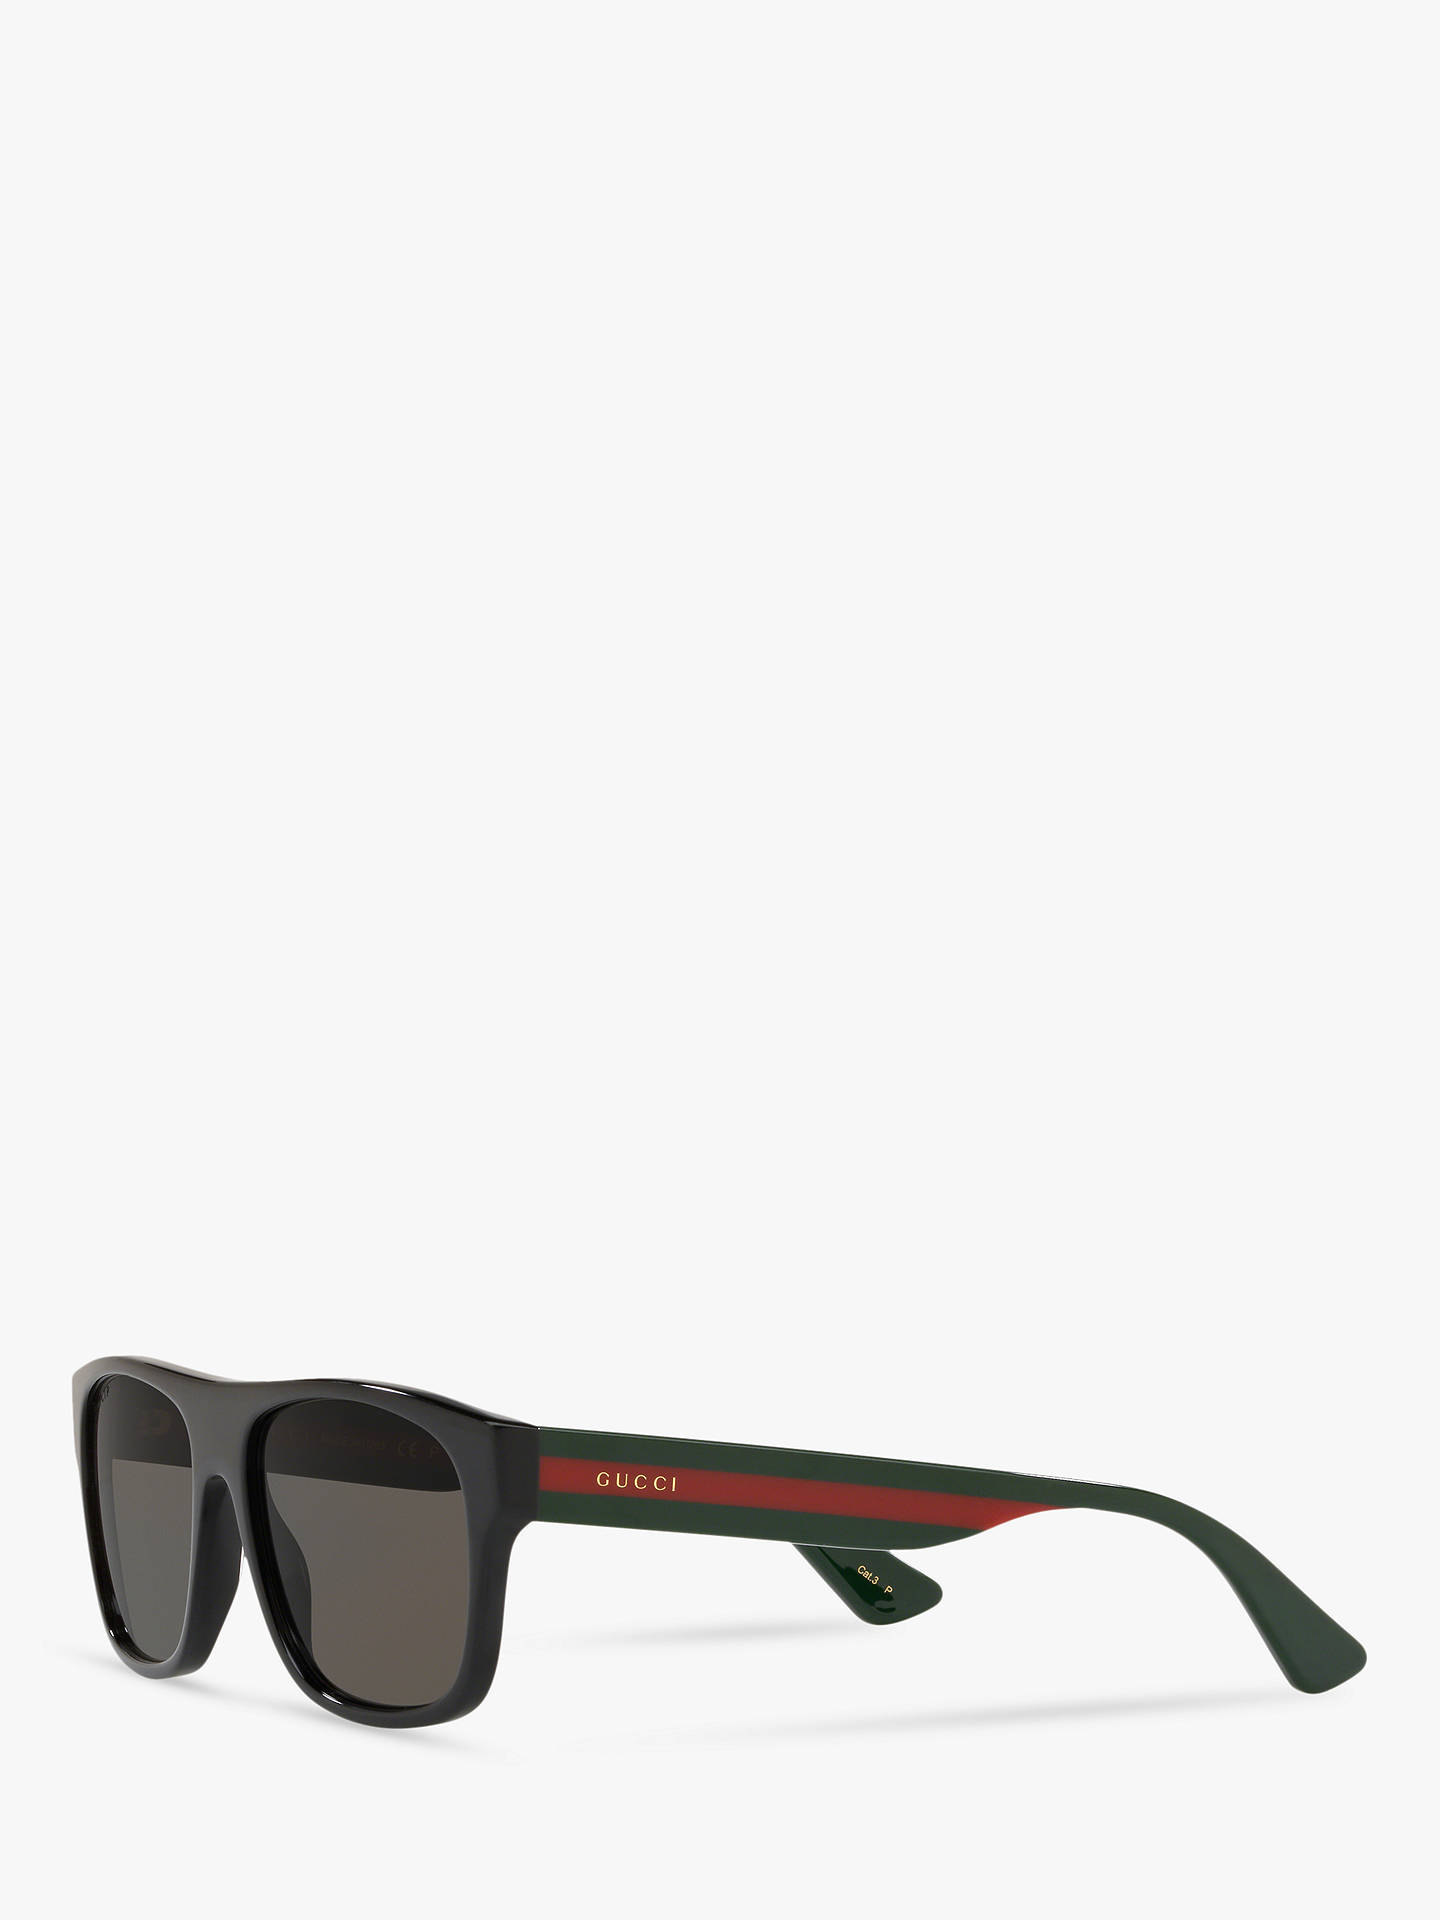 0d7f1d39b ... Buy Gucci GG0341S Men's Rectangular Sunglasses, Multi/Black Online at  johnlewis. ...